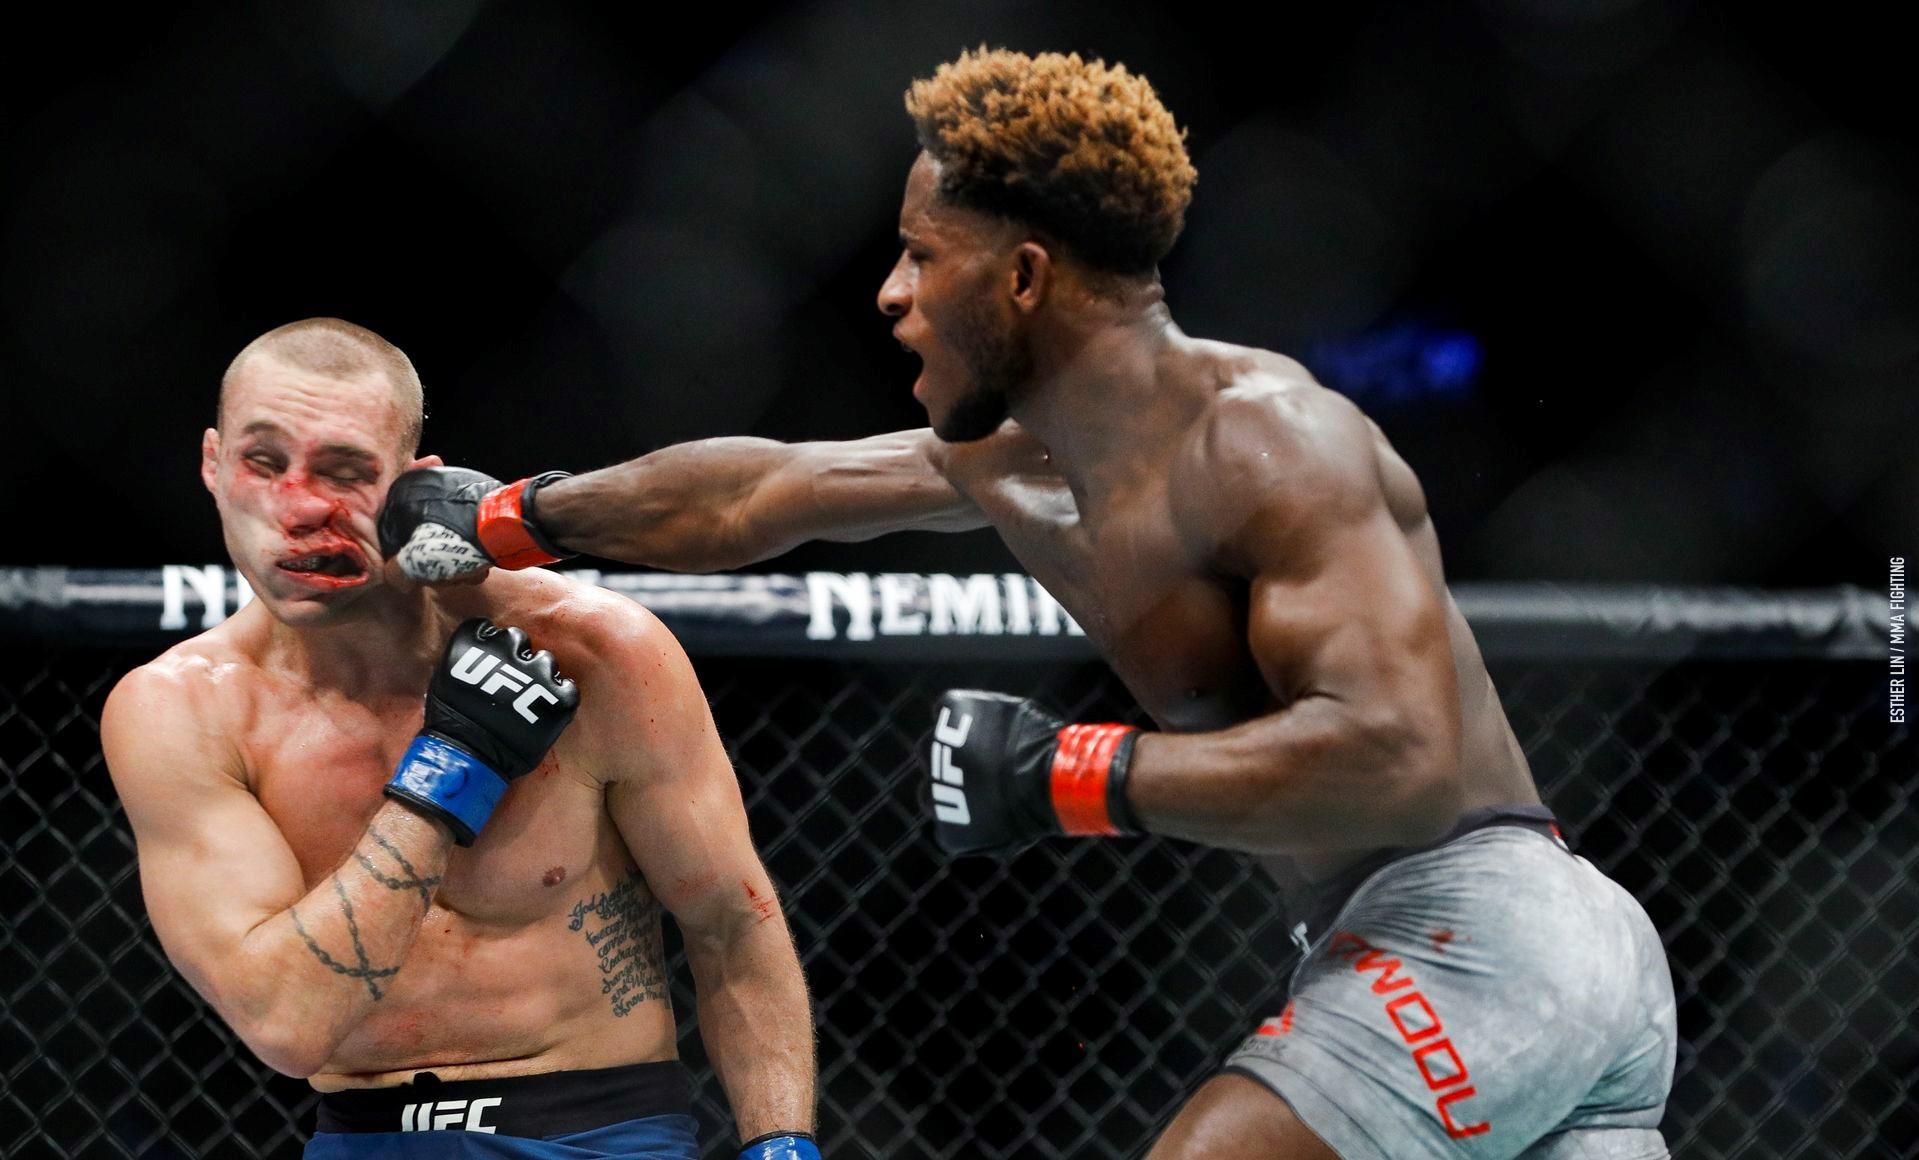 UFC 231 'Holloway vs. Ortega' Results - Hakeem Dawodu Picks Up a Split Decision Victory - Hakeem